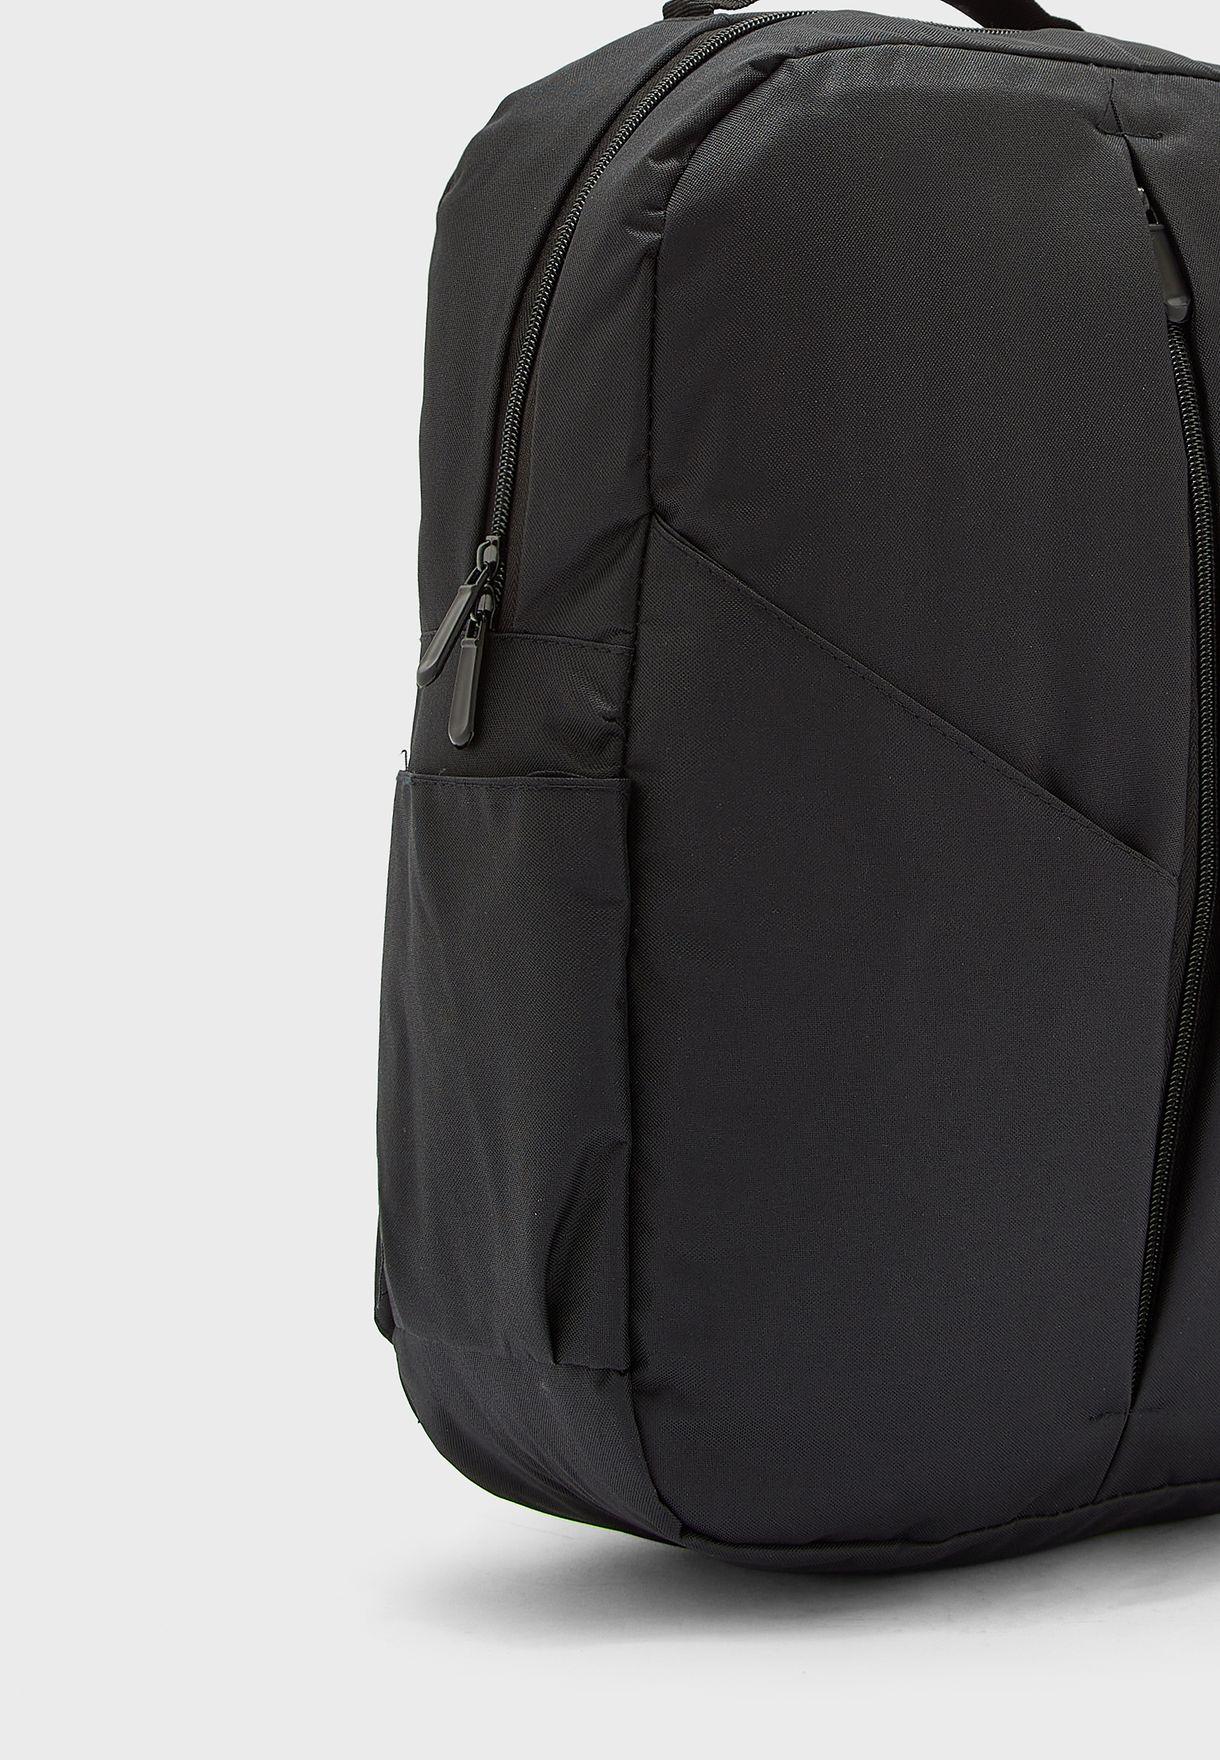 3Pcs Backpack Set